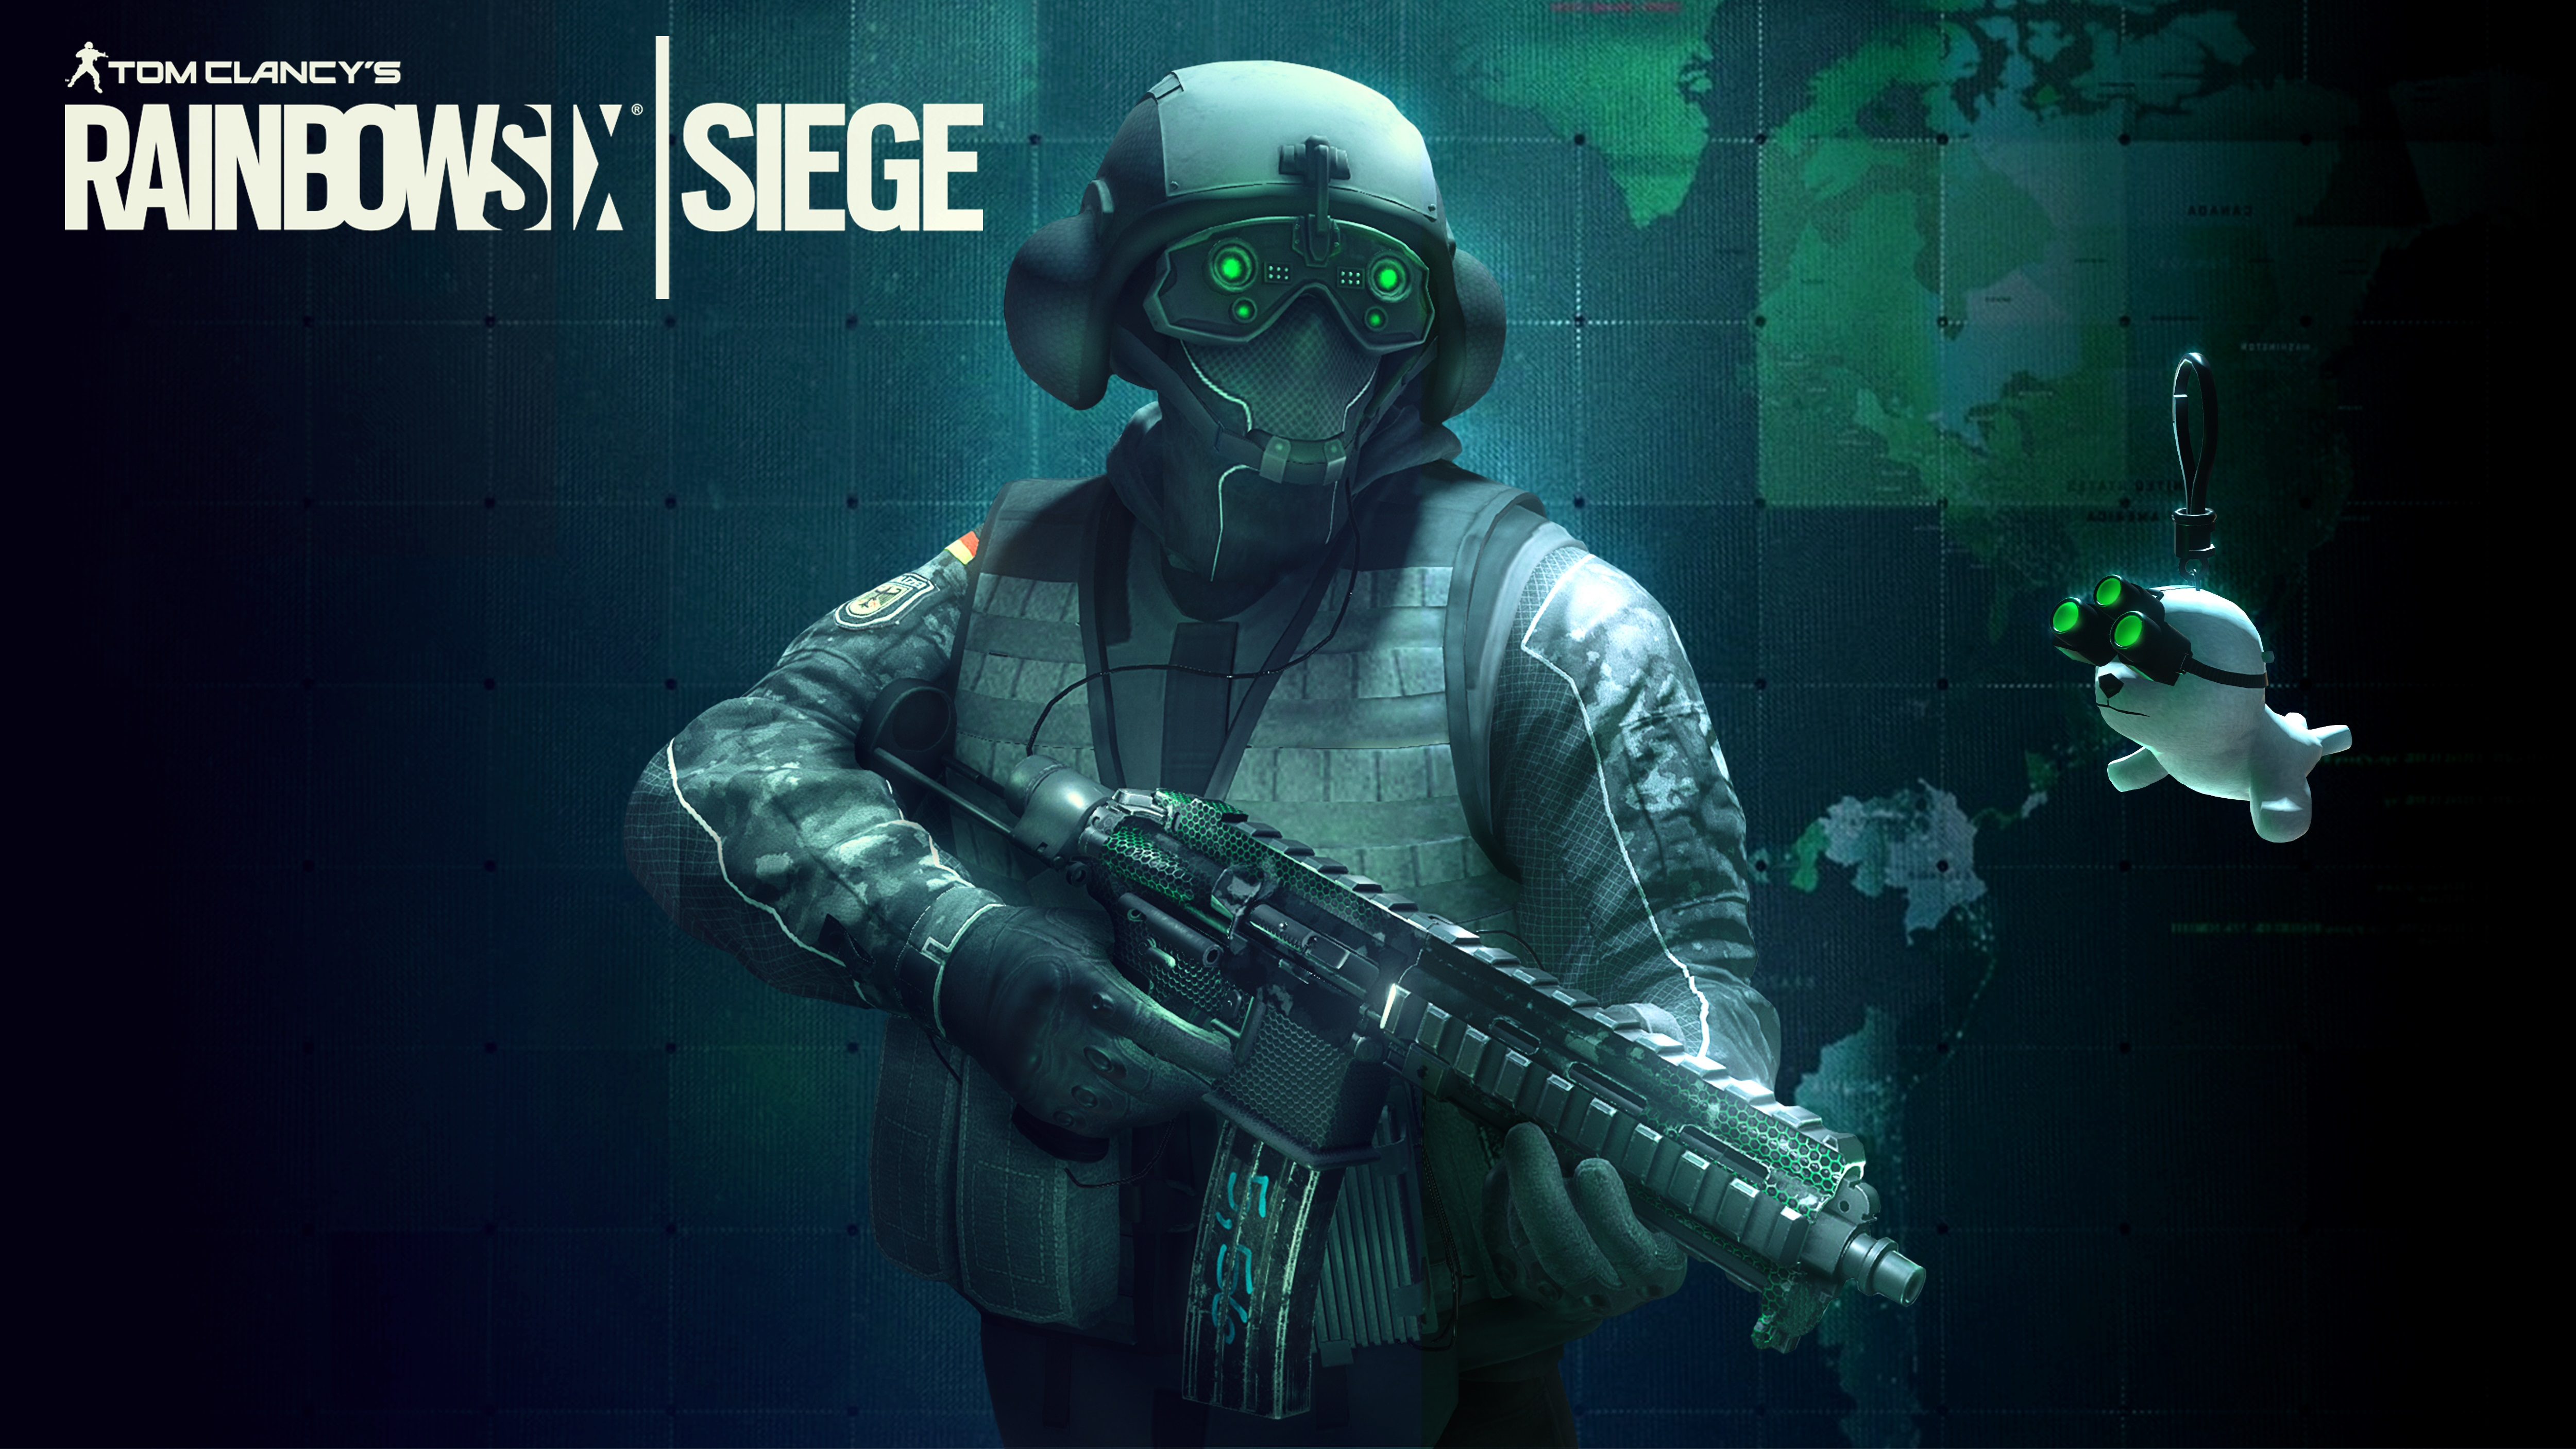 splinter cell rainbow six siege